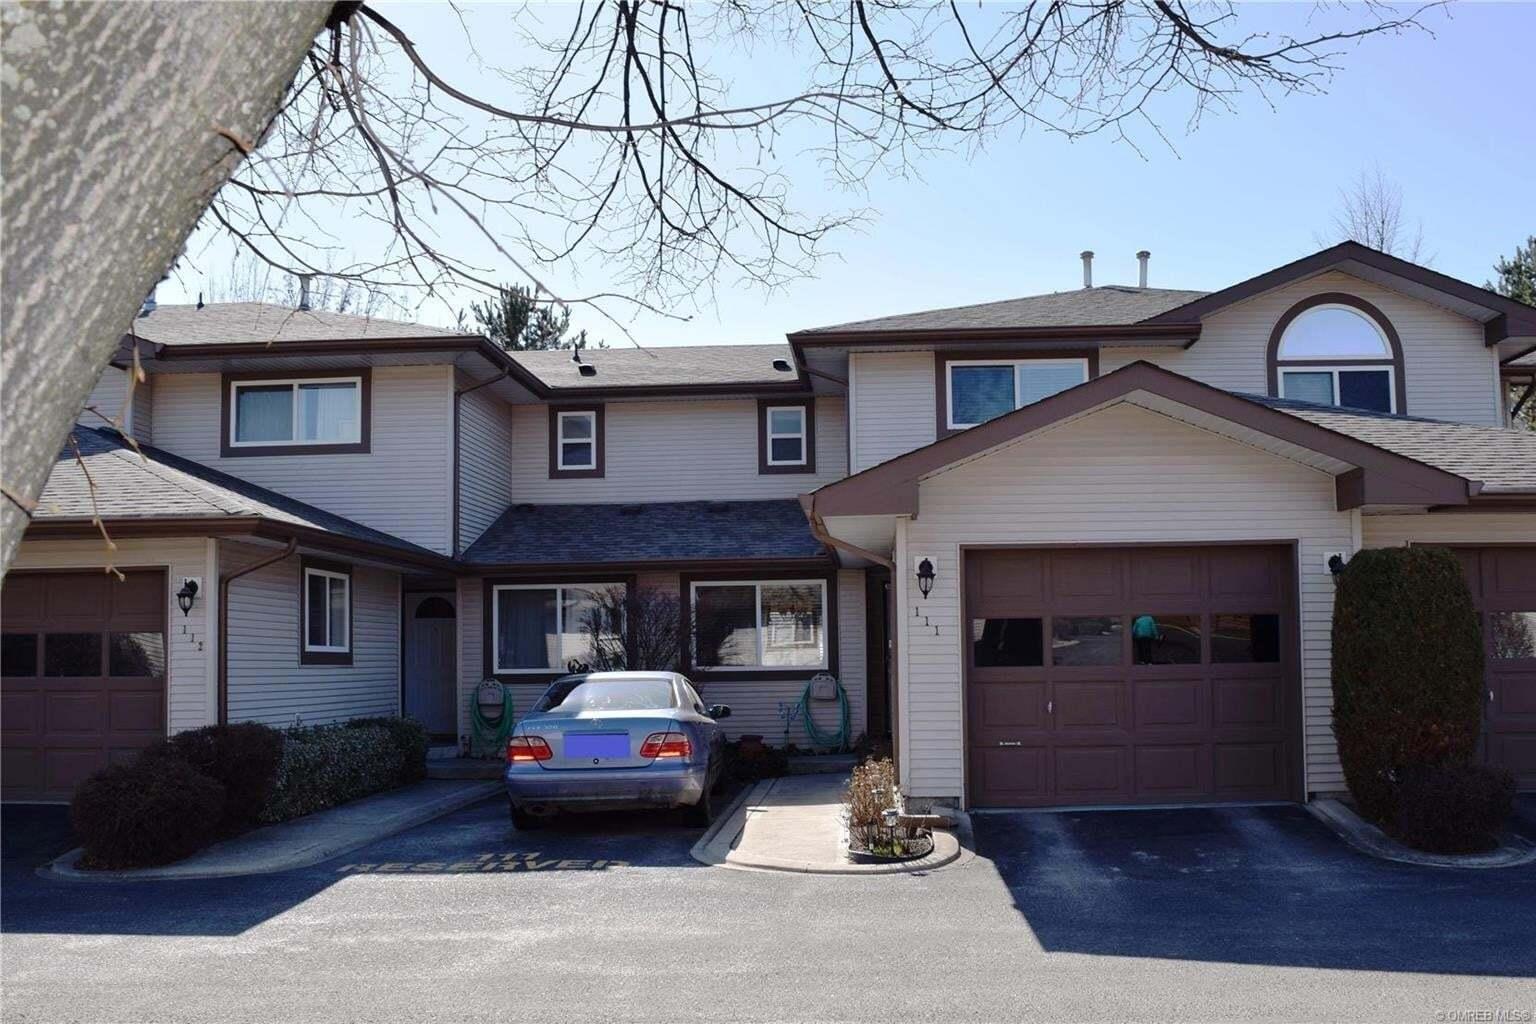 Townhouse for sale at 133 Wyndham Cres Kelowna British Columbia - MLS: 10201555